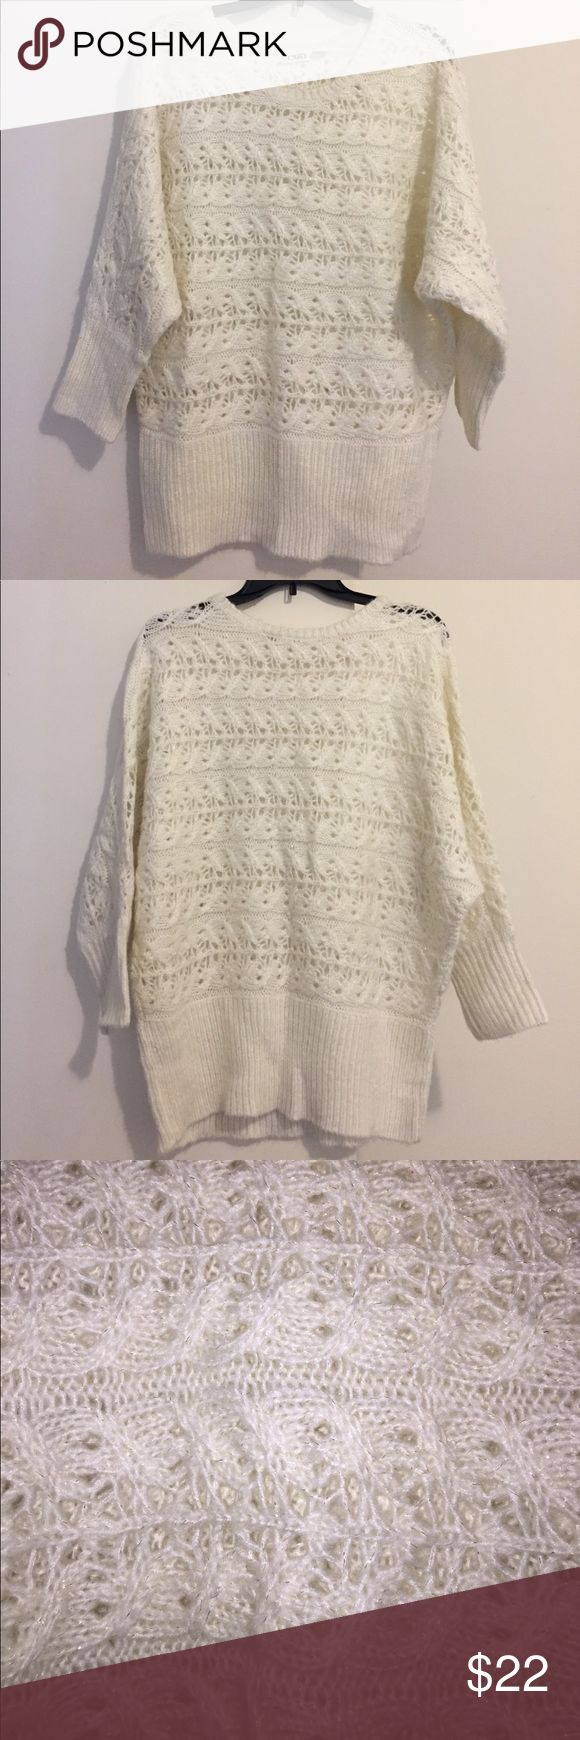 Cato Cream Sweater Cato cream sweater, size XLarge. Has glitter thread detail. Cato Sweaters Crew & Scoop Necks